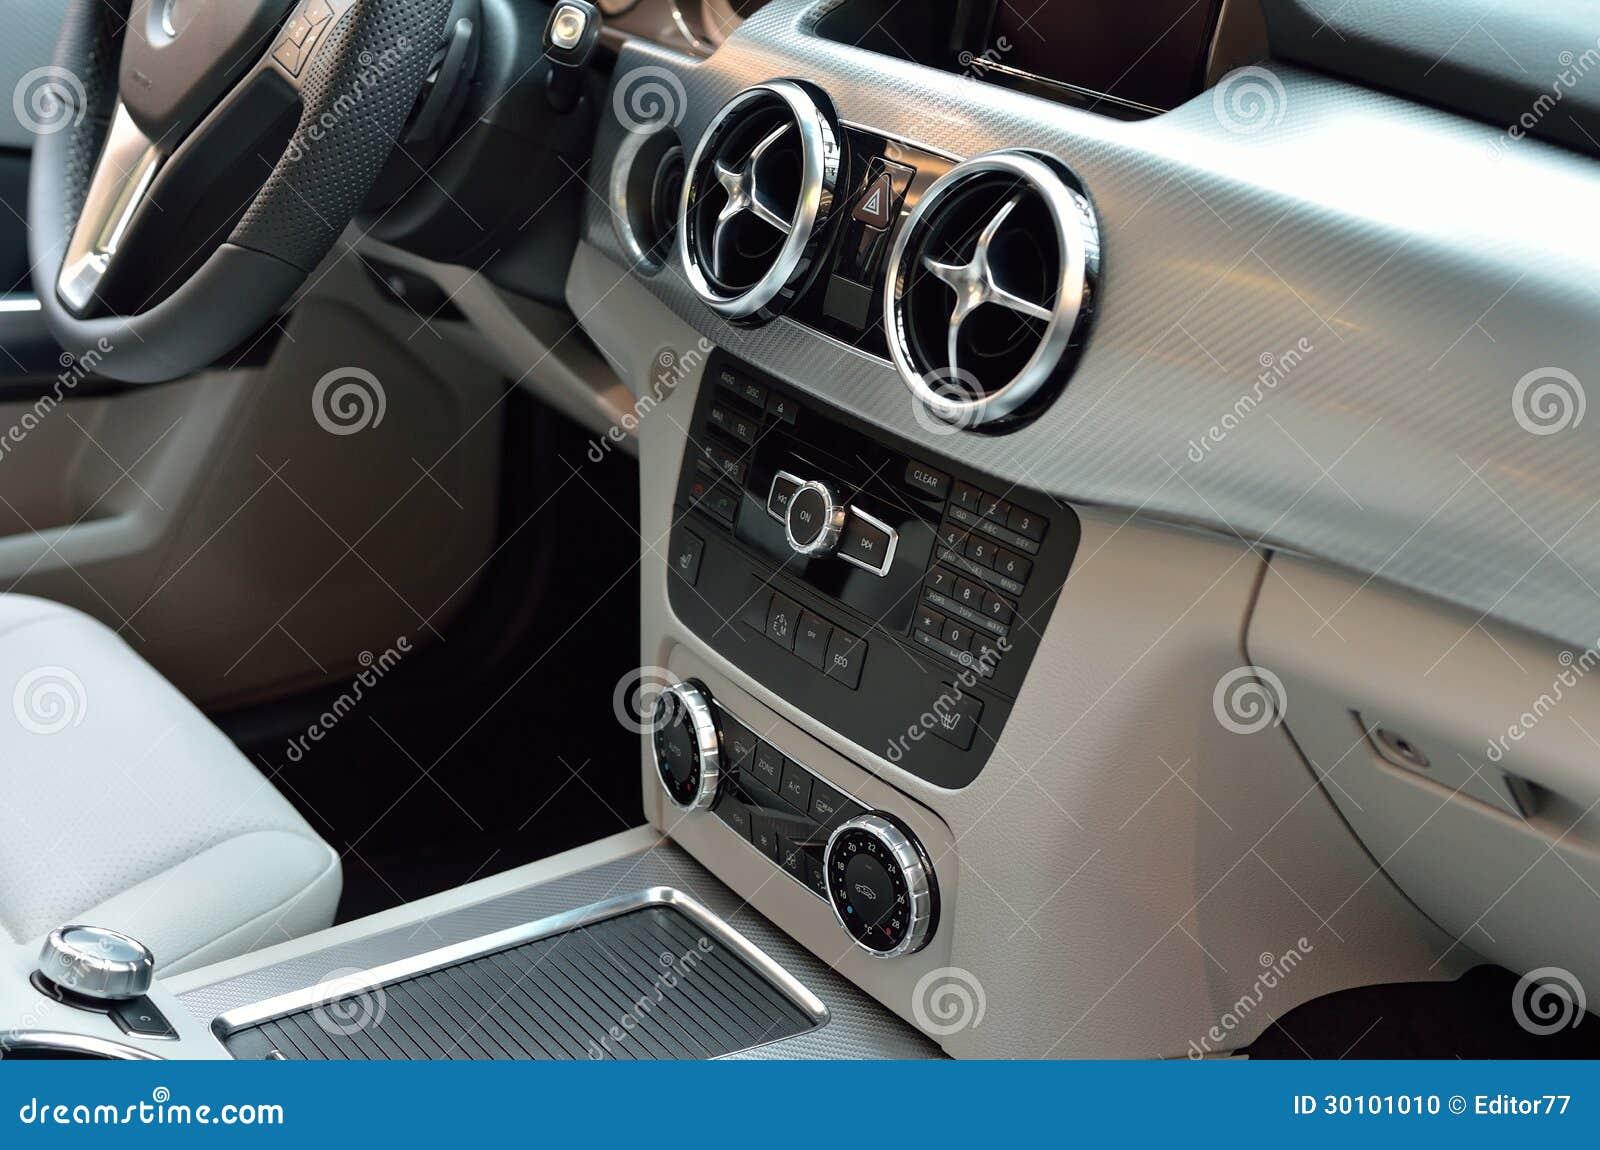 luxury car interior stock photo image of concept brand 30101010. Black Bedroom Furniture Sets. Home Design Ideas